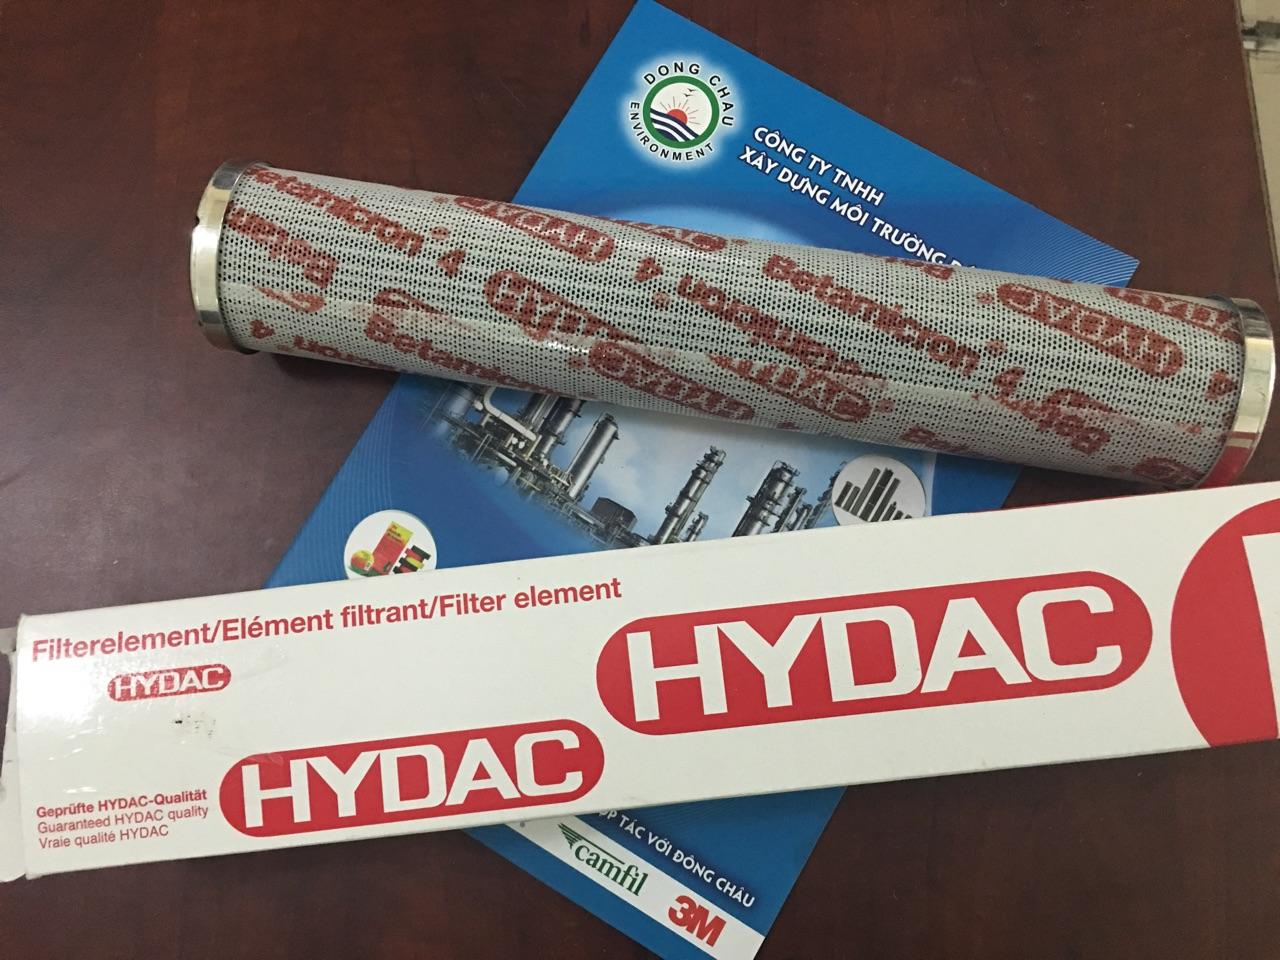 Lõi lọc dầu thủy lực Hydac Mobile Filters